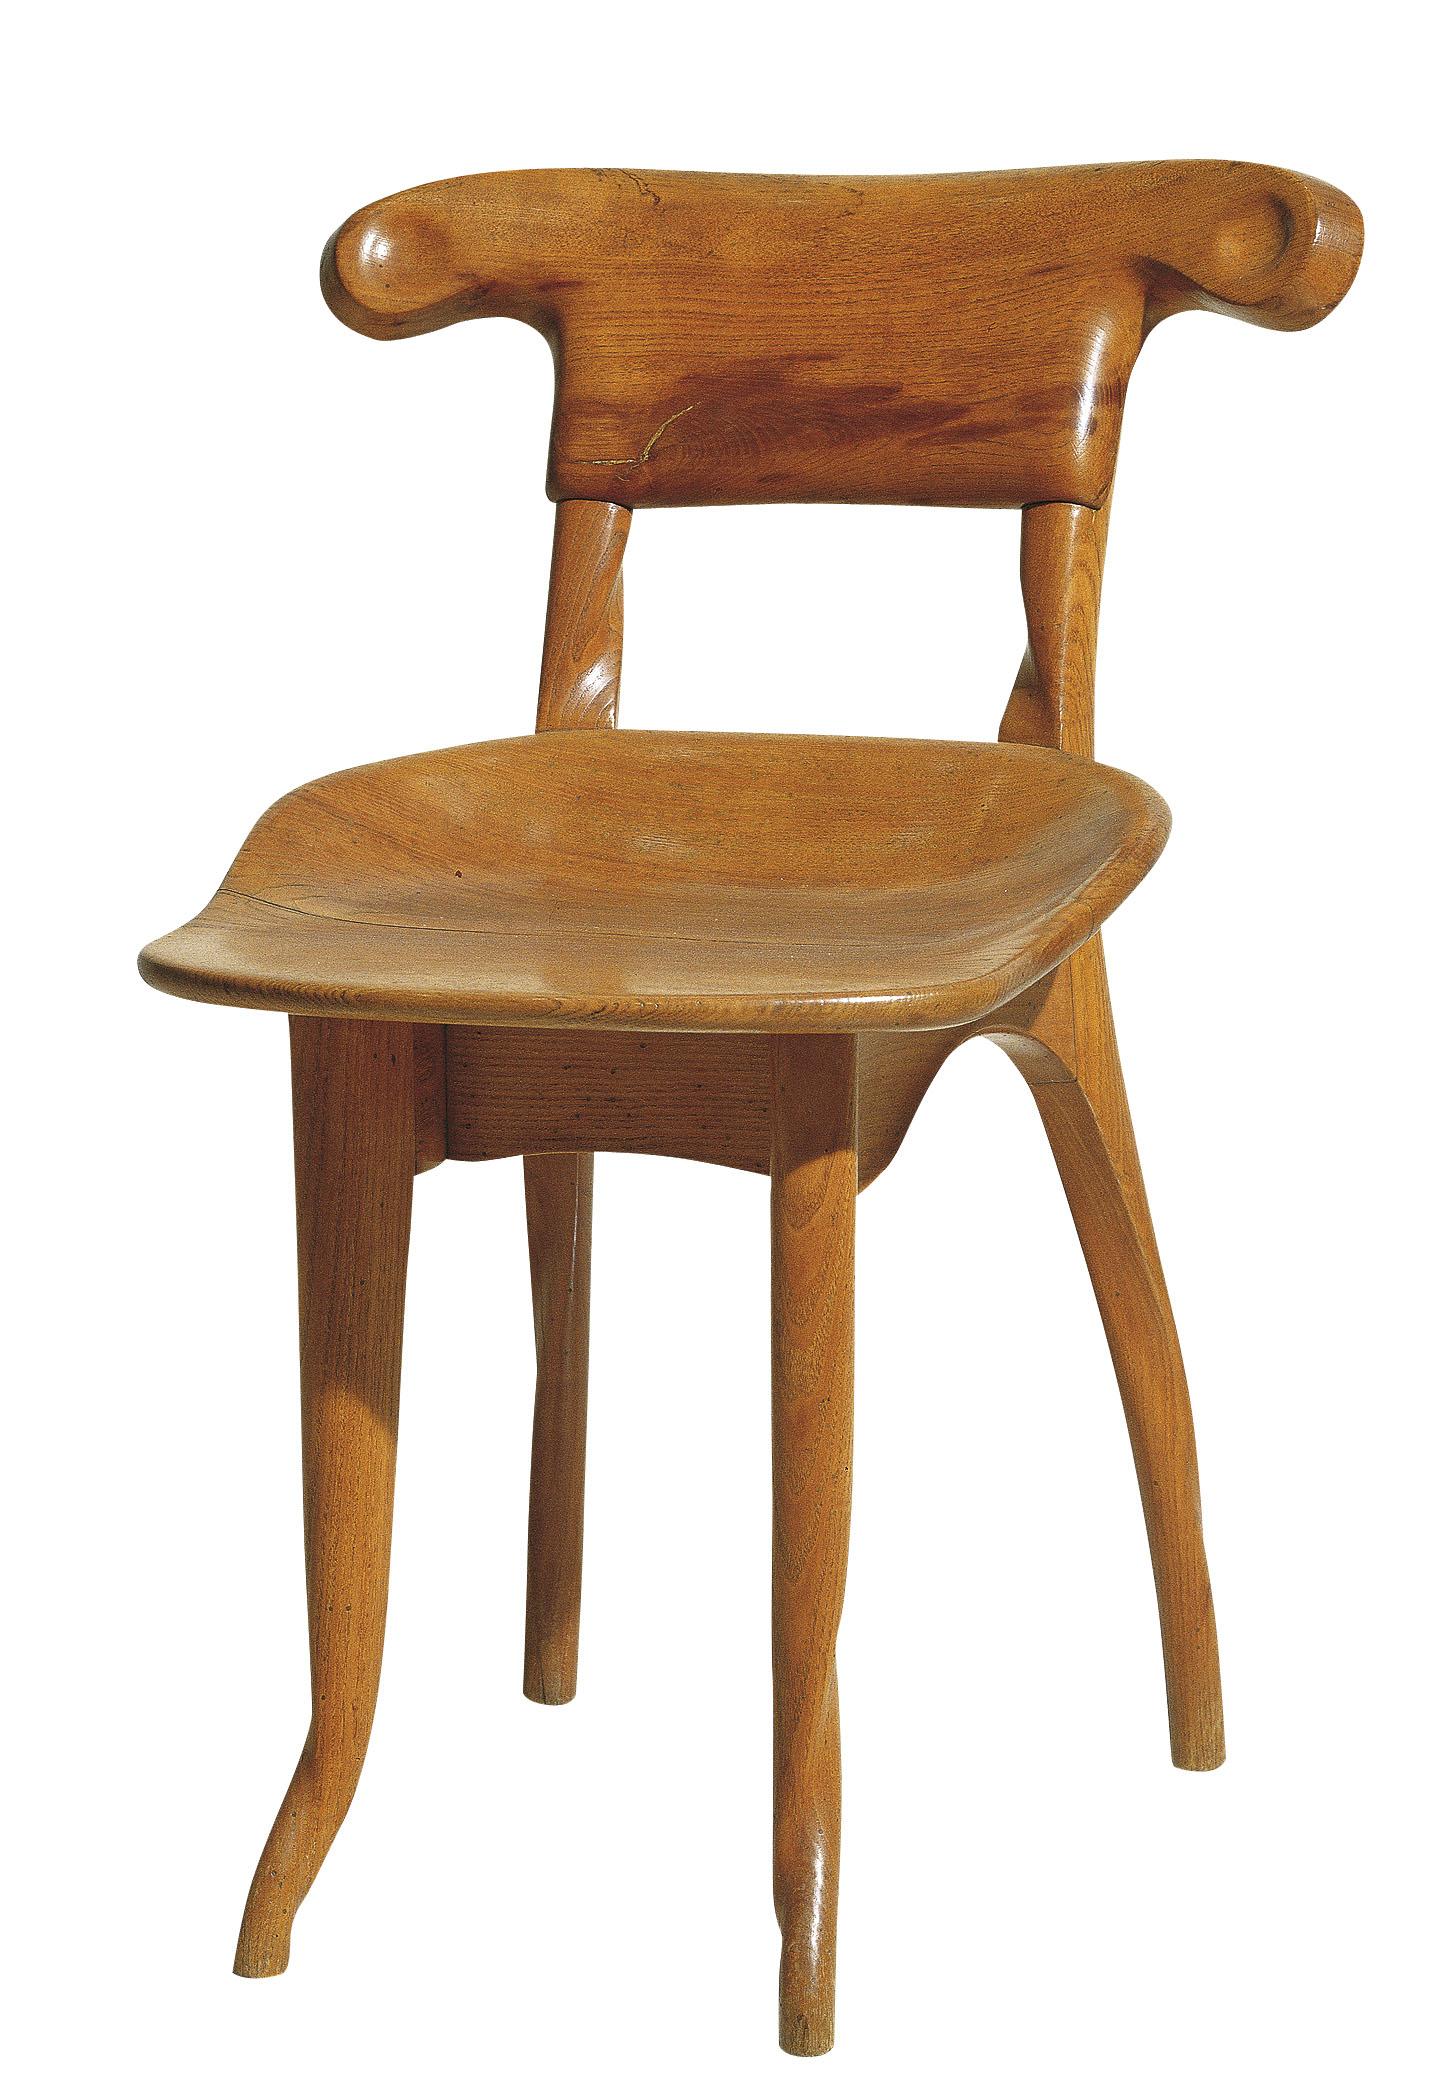 upright recliner chairs desk chair mat for carpet museu nacional d 39art de catalunya